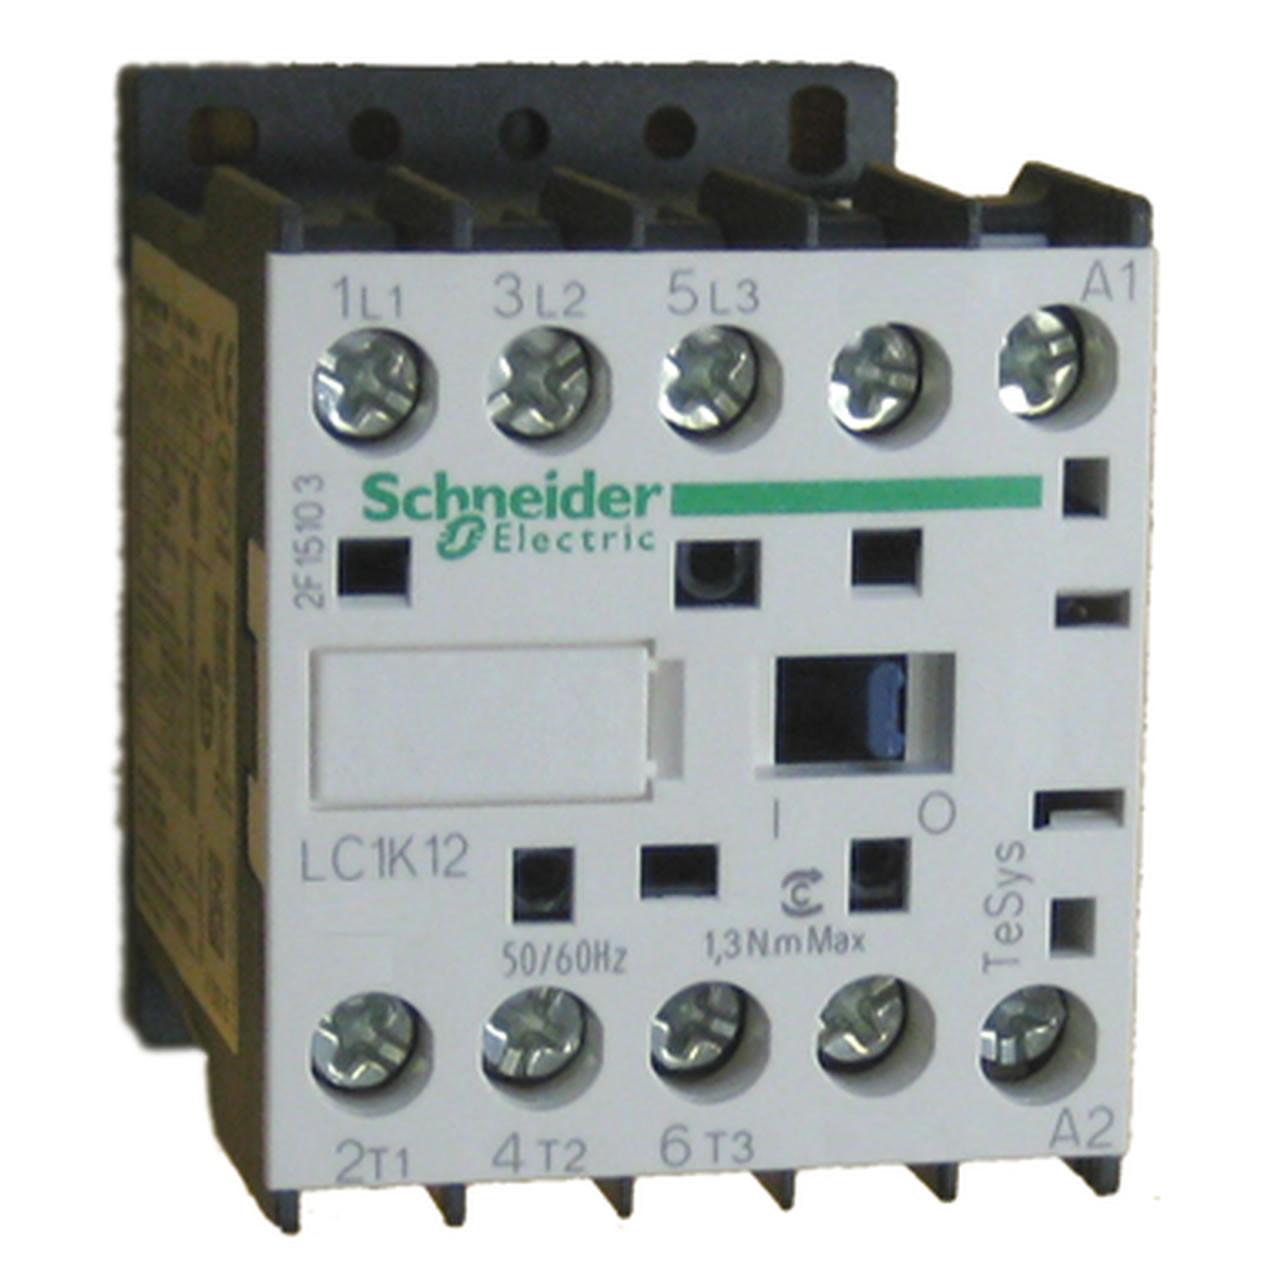 Schneider Electric LC1K1201L7 contactor